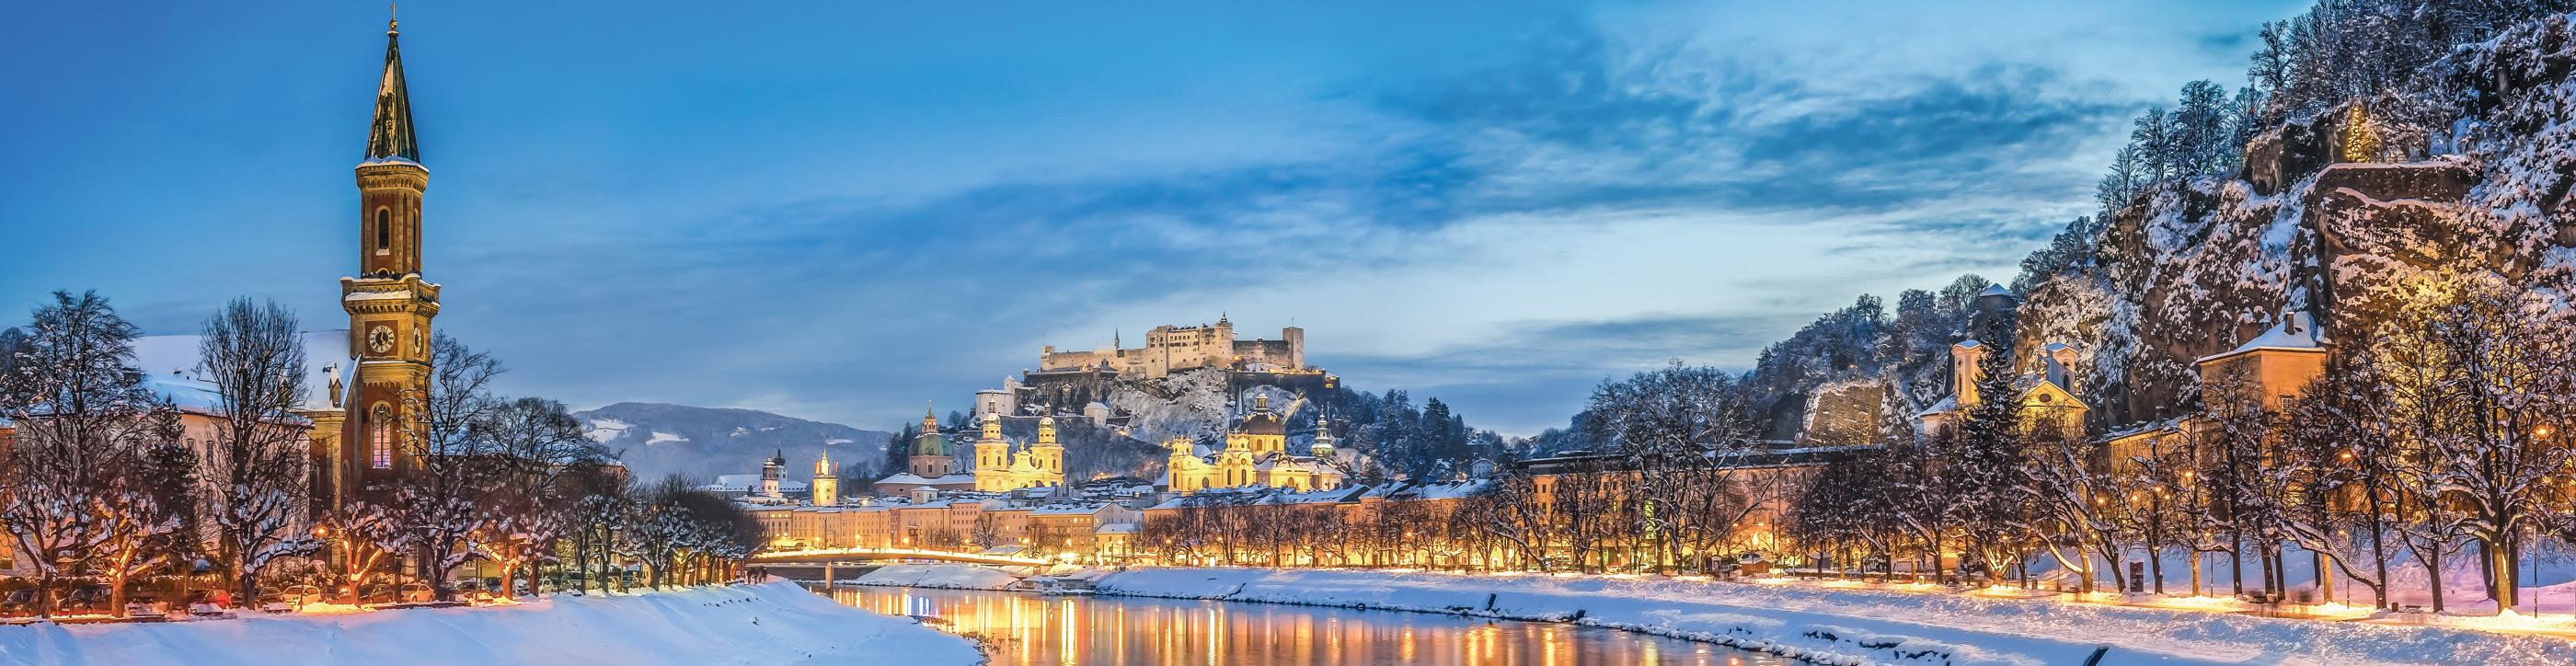 Grand Christmas & New Year's 2017 | Europe River Cruise | Uniworld ...